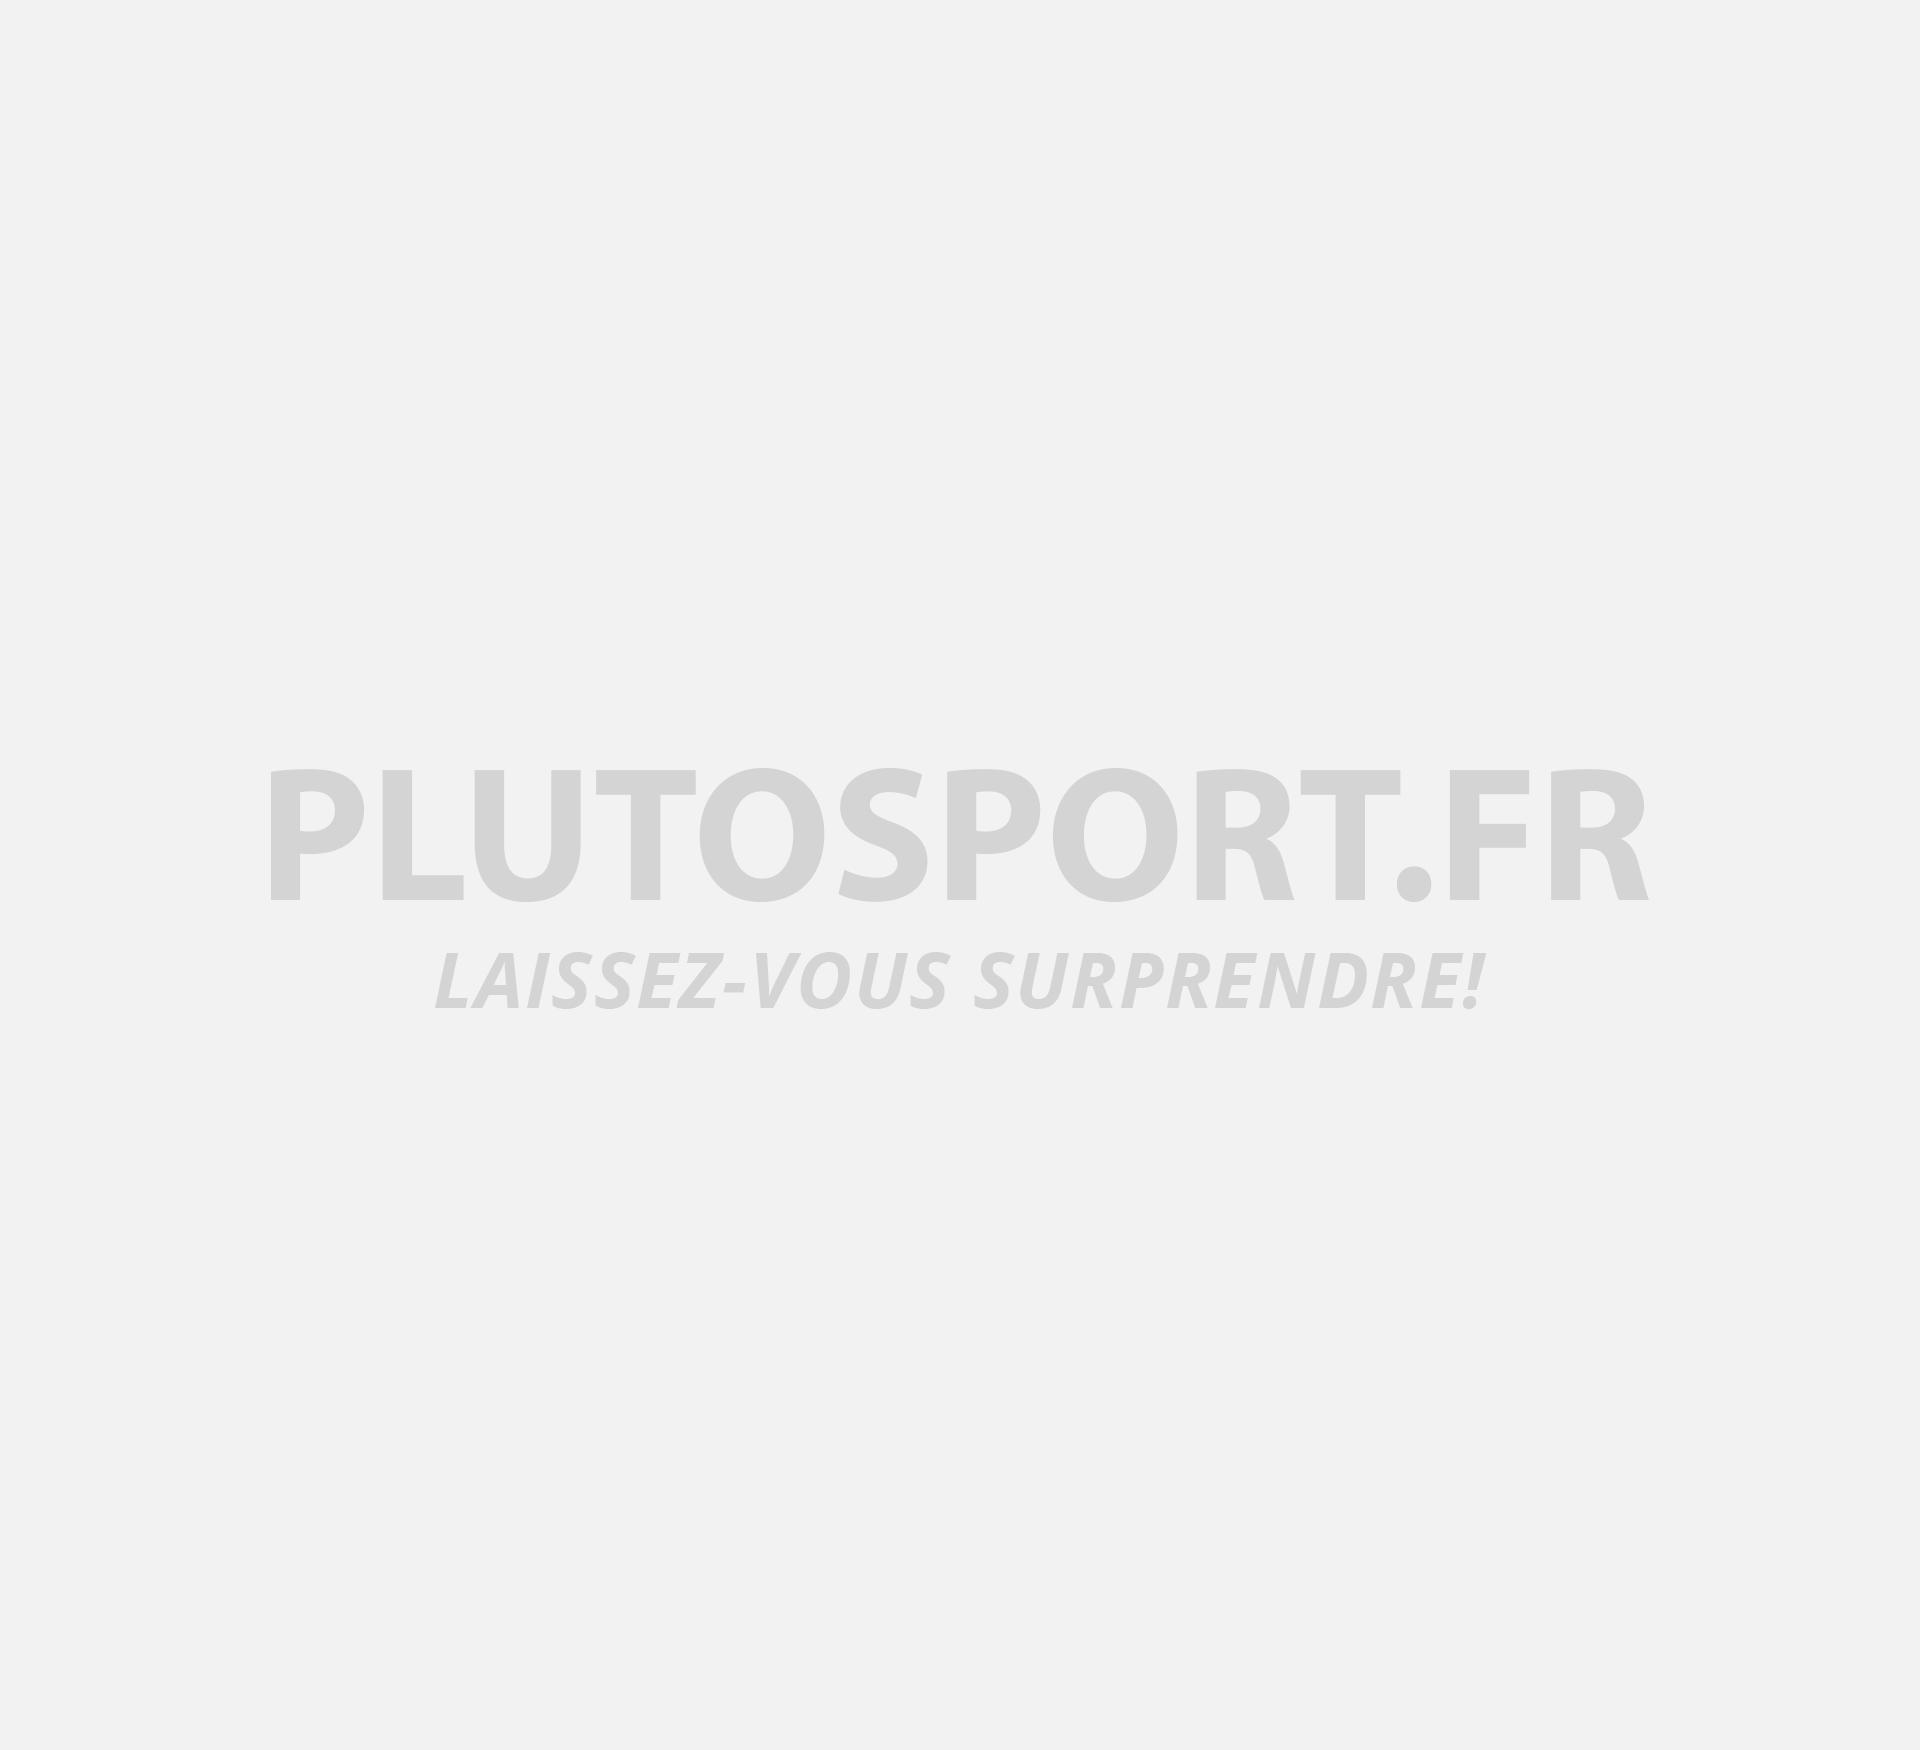 Le t-shirt  pour femmes Superdry Premium Goods Jumbo Rhinestone Entry Tee